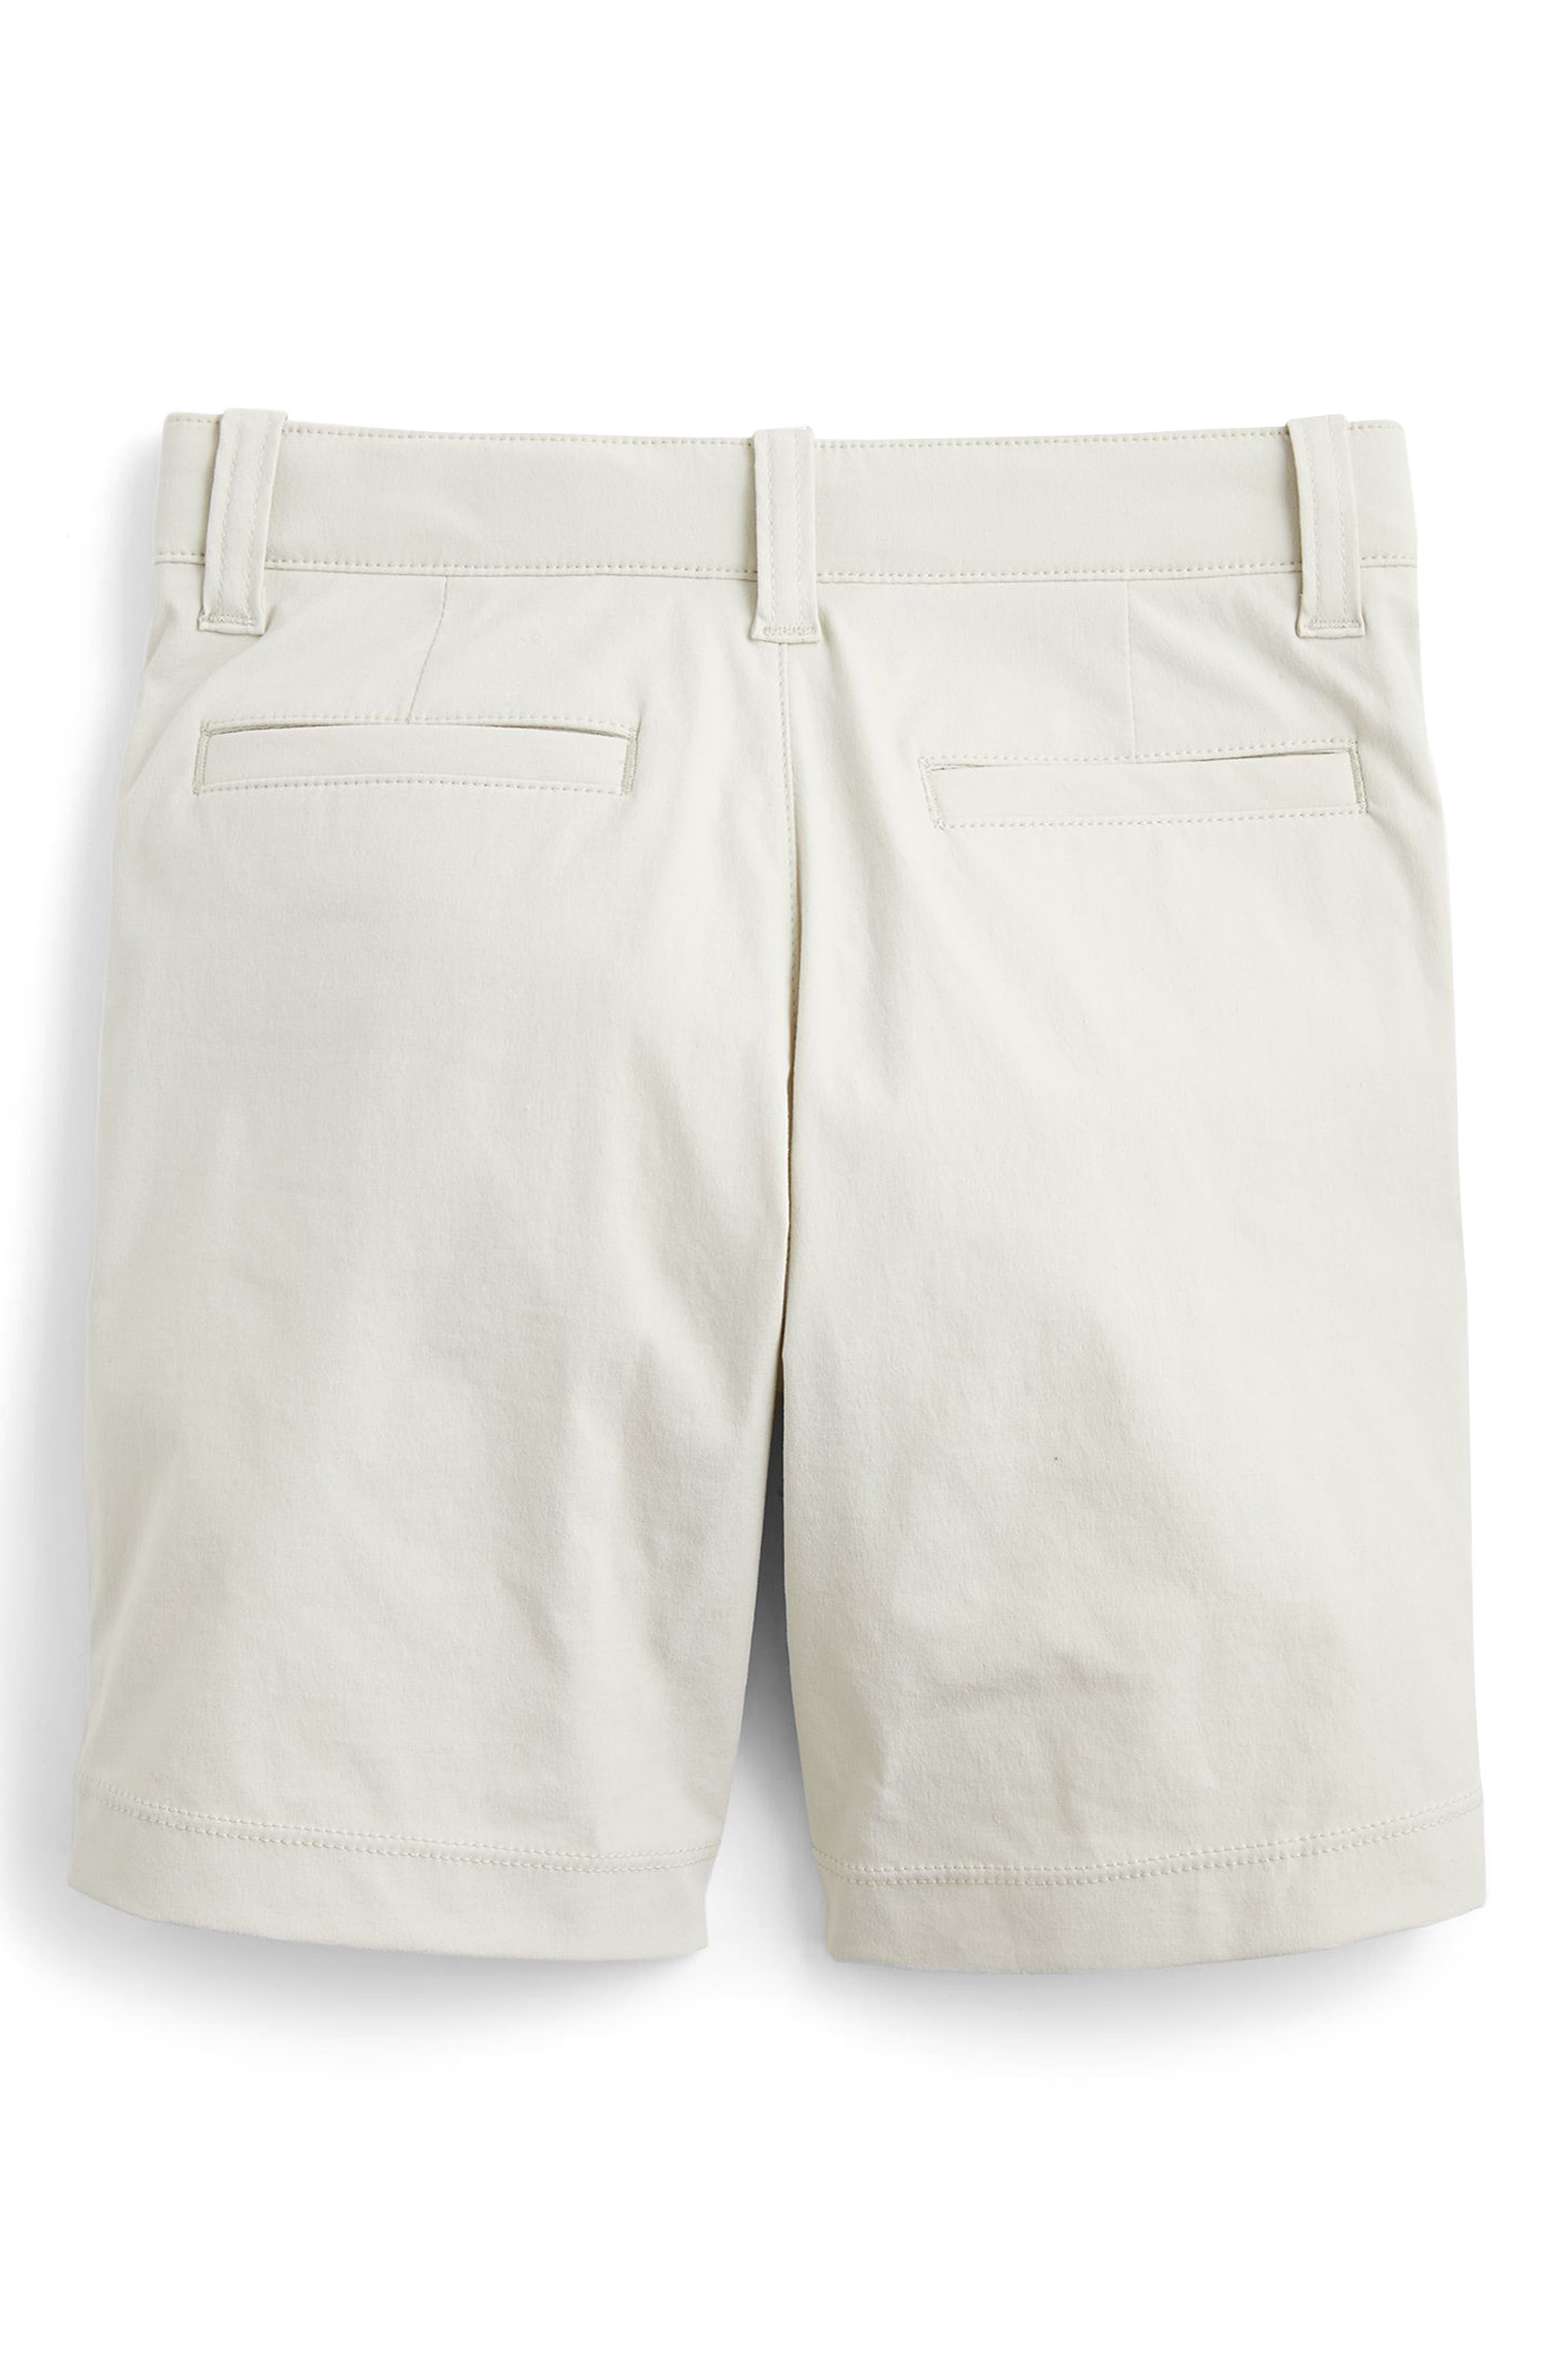 Tech Shorts,                             Alternate thumbnail 2, color,                             250